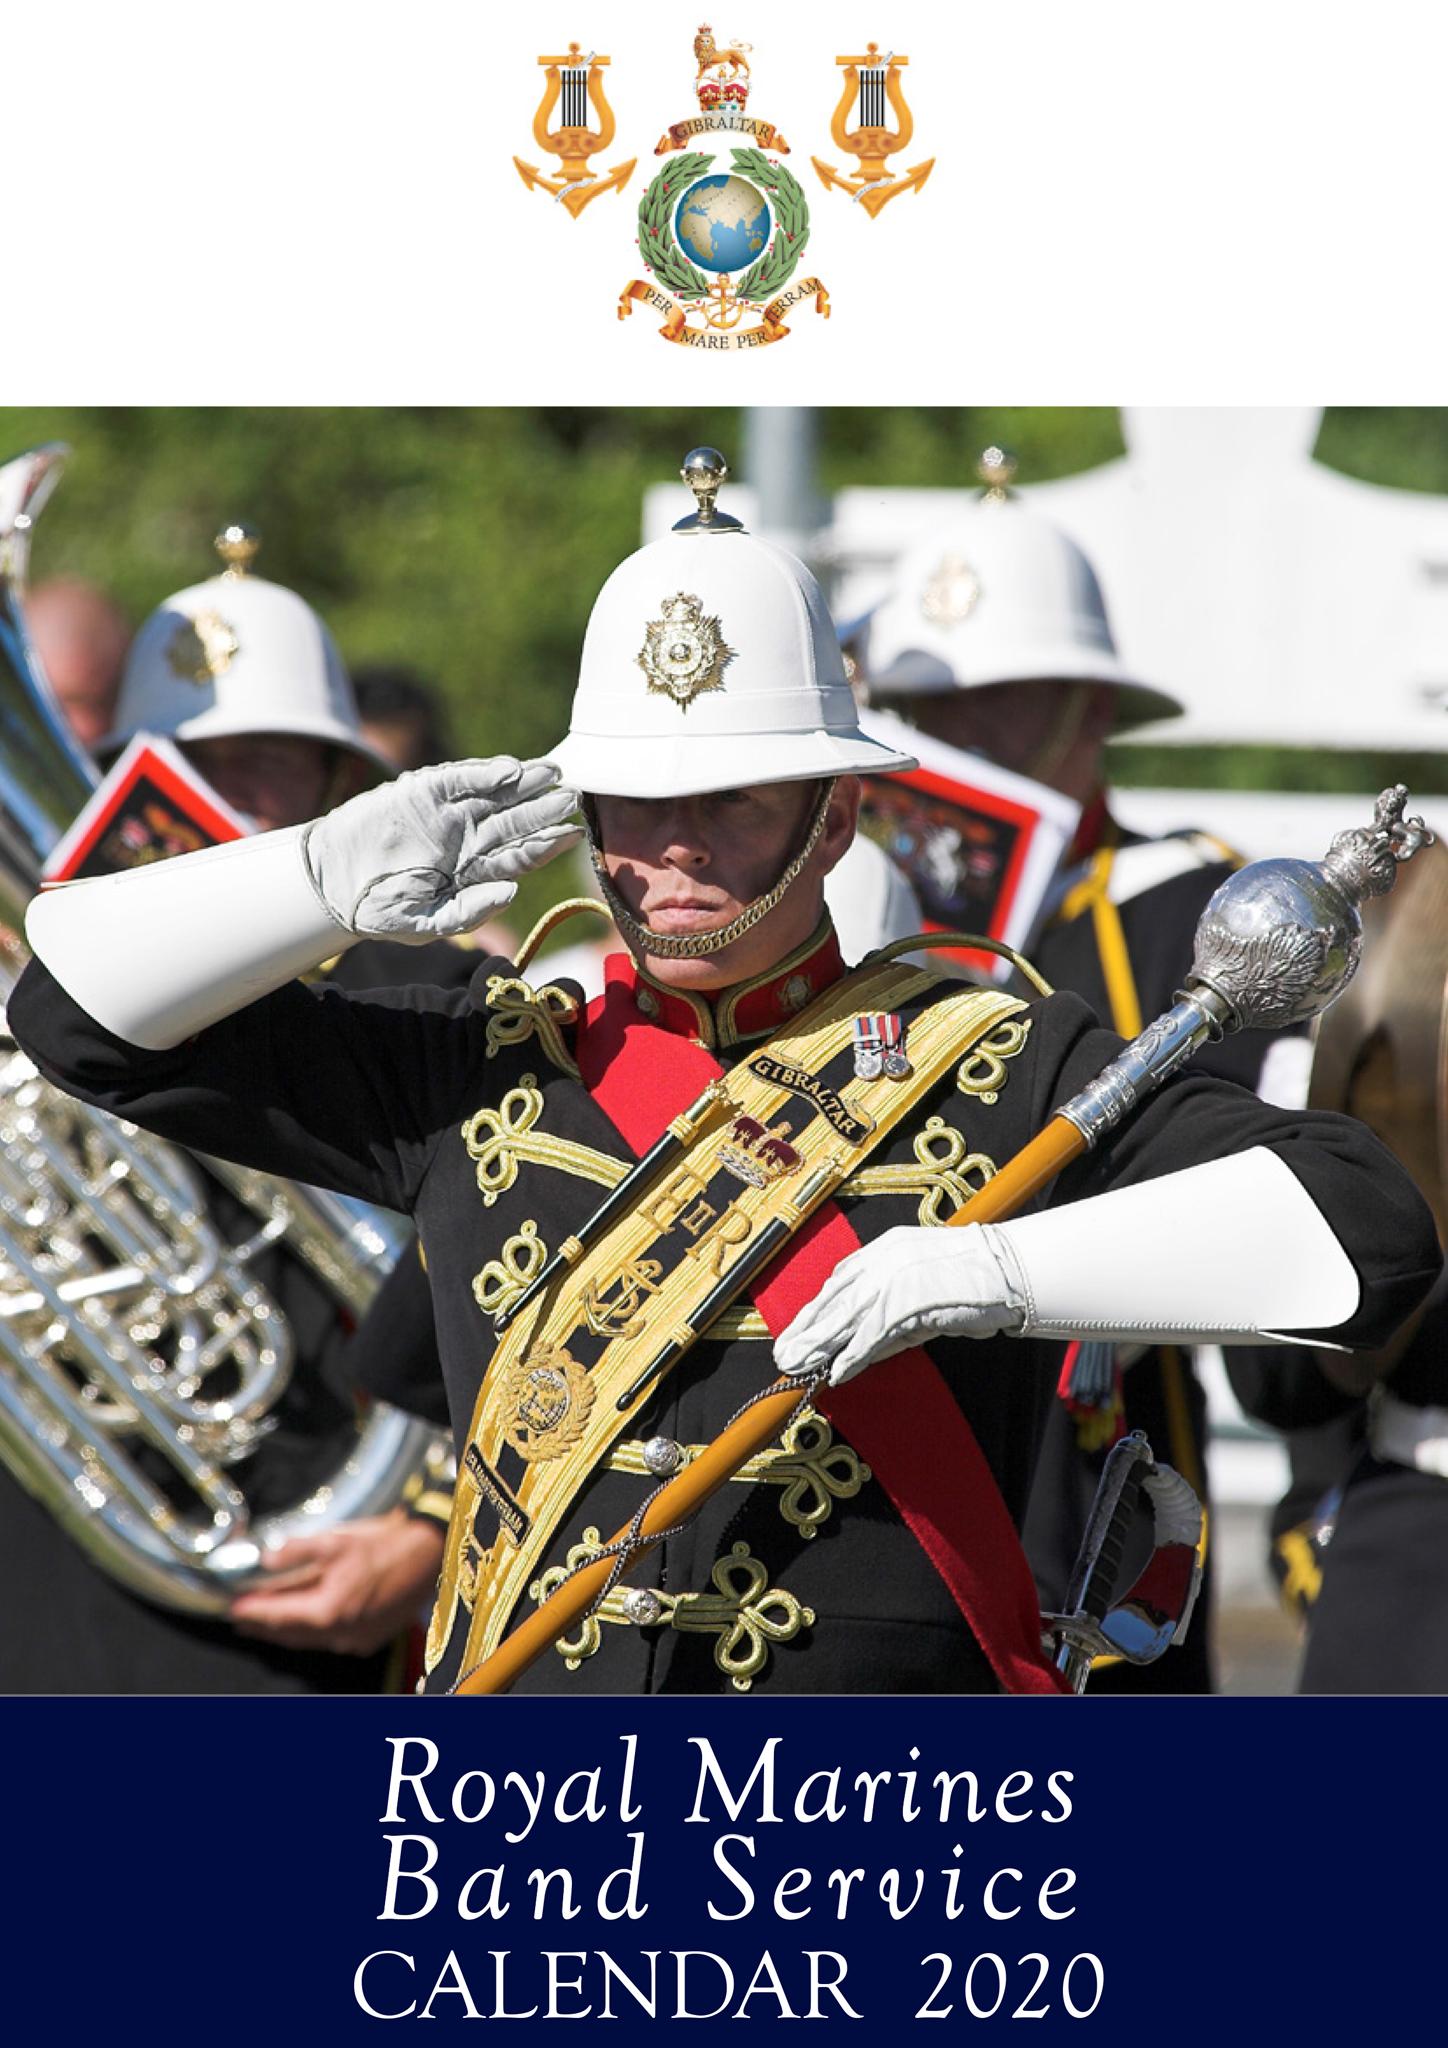 The 2020 Royal Marines Band Service Calendar